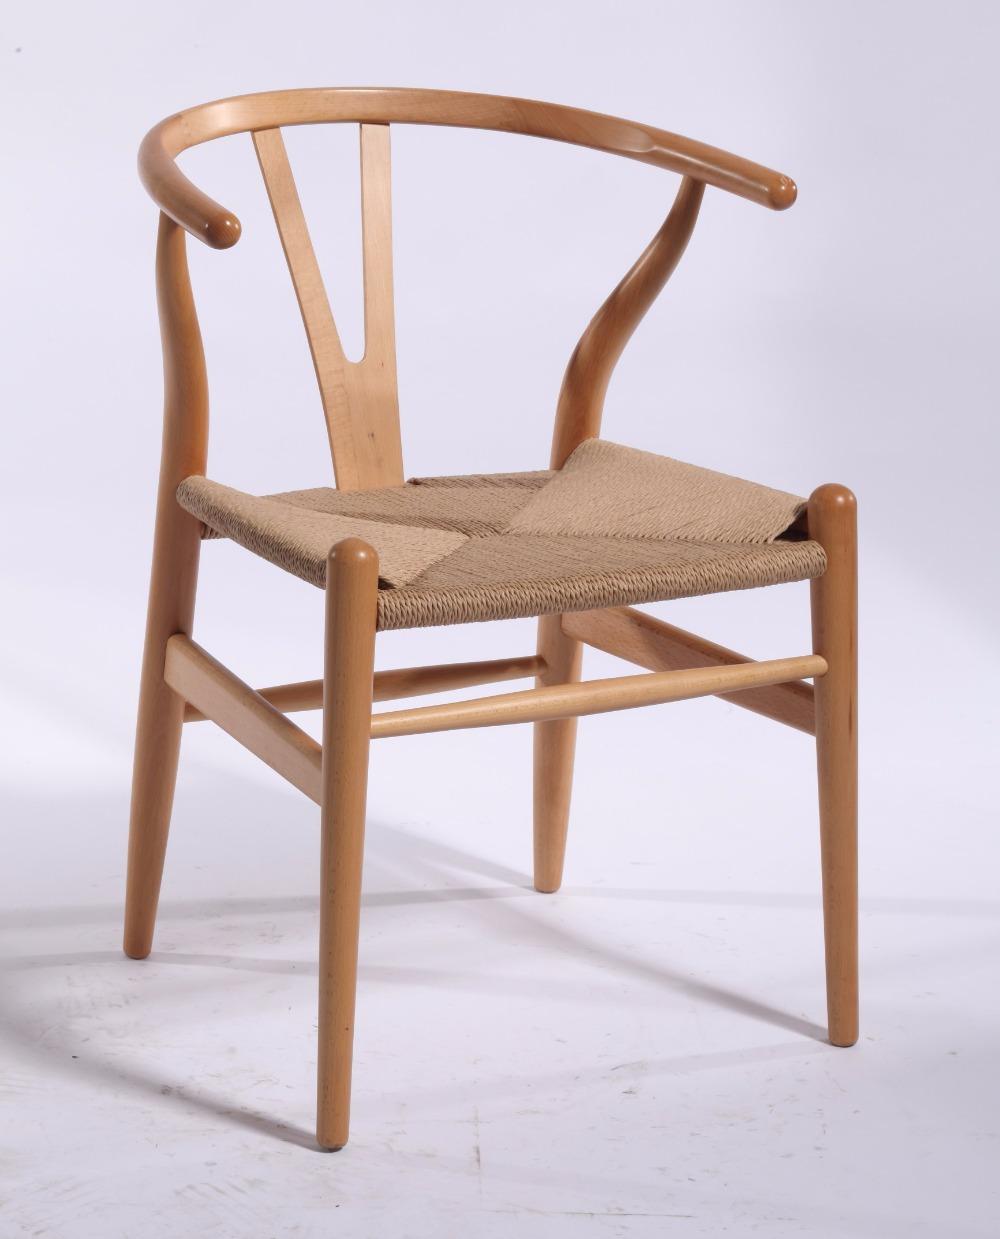 online kaufen gro handel hans wegner stuhl querlenker aus china hans wegner stuhl querlenker. Black Bedroom Furniture Sets. Home Design Ideas